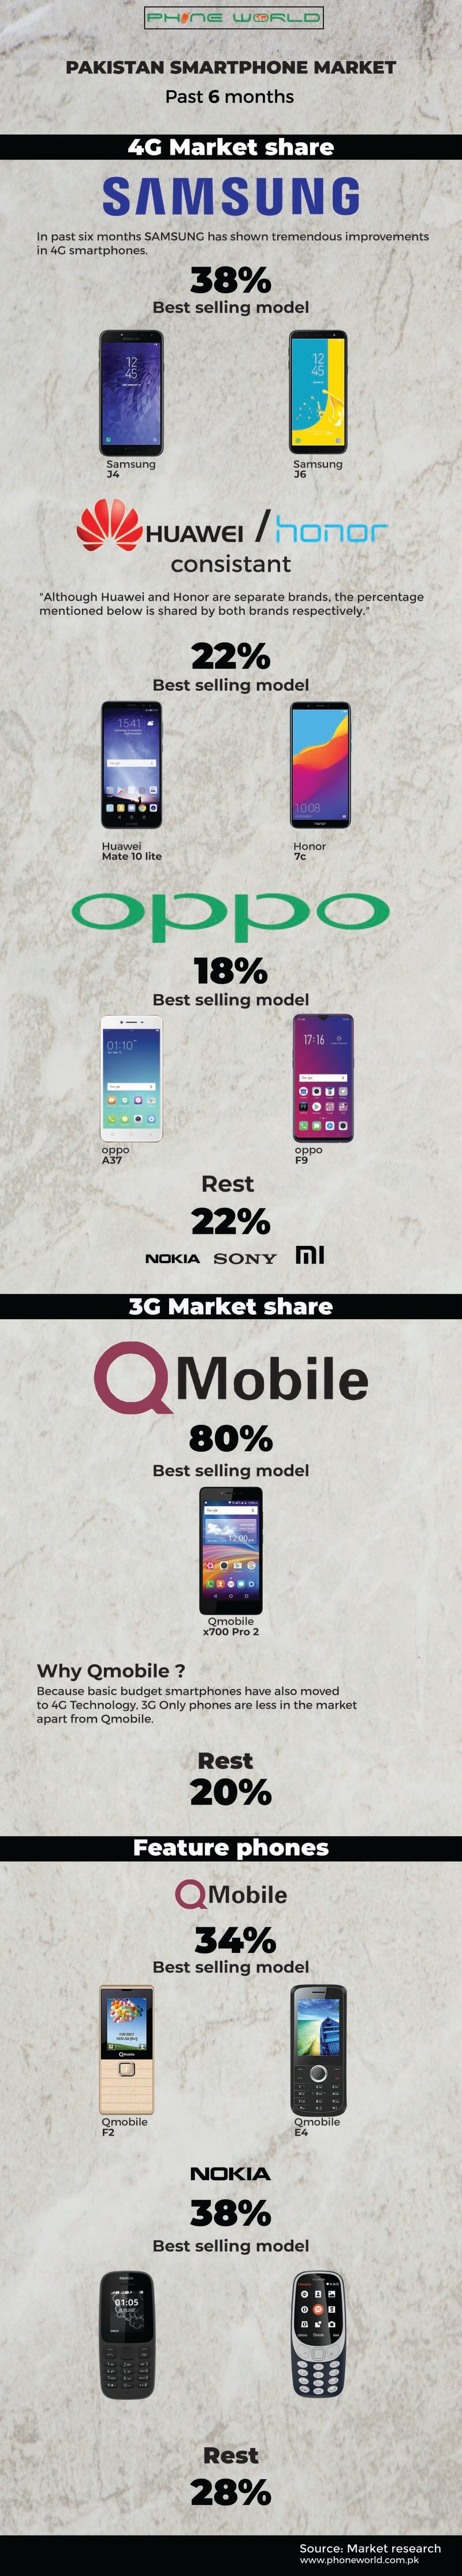 2g 3g 4g Market share in Pakistan